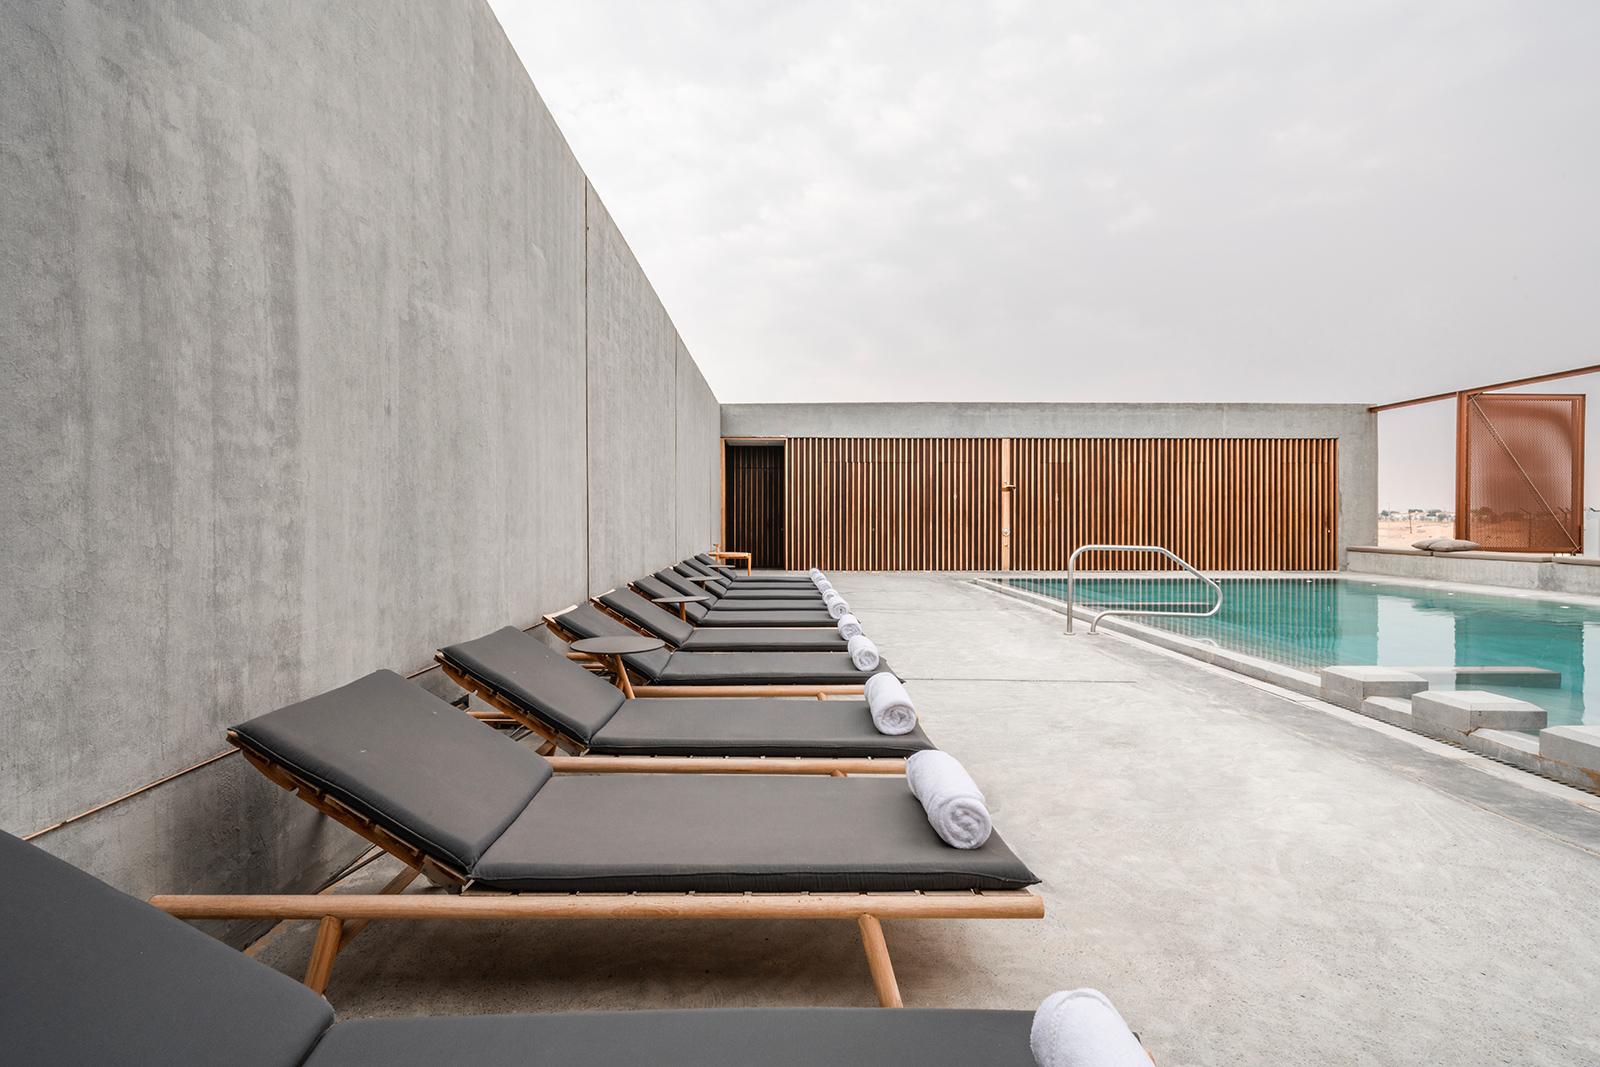 The concrete swimming pool and area at Al Faya Lodge, UAE